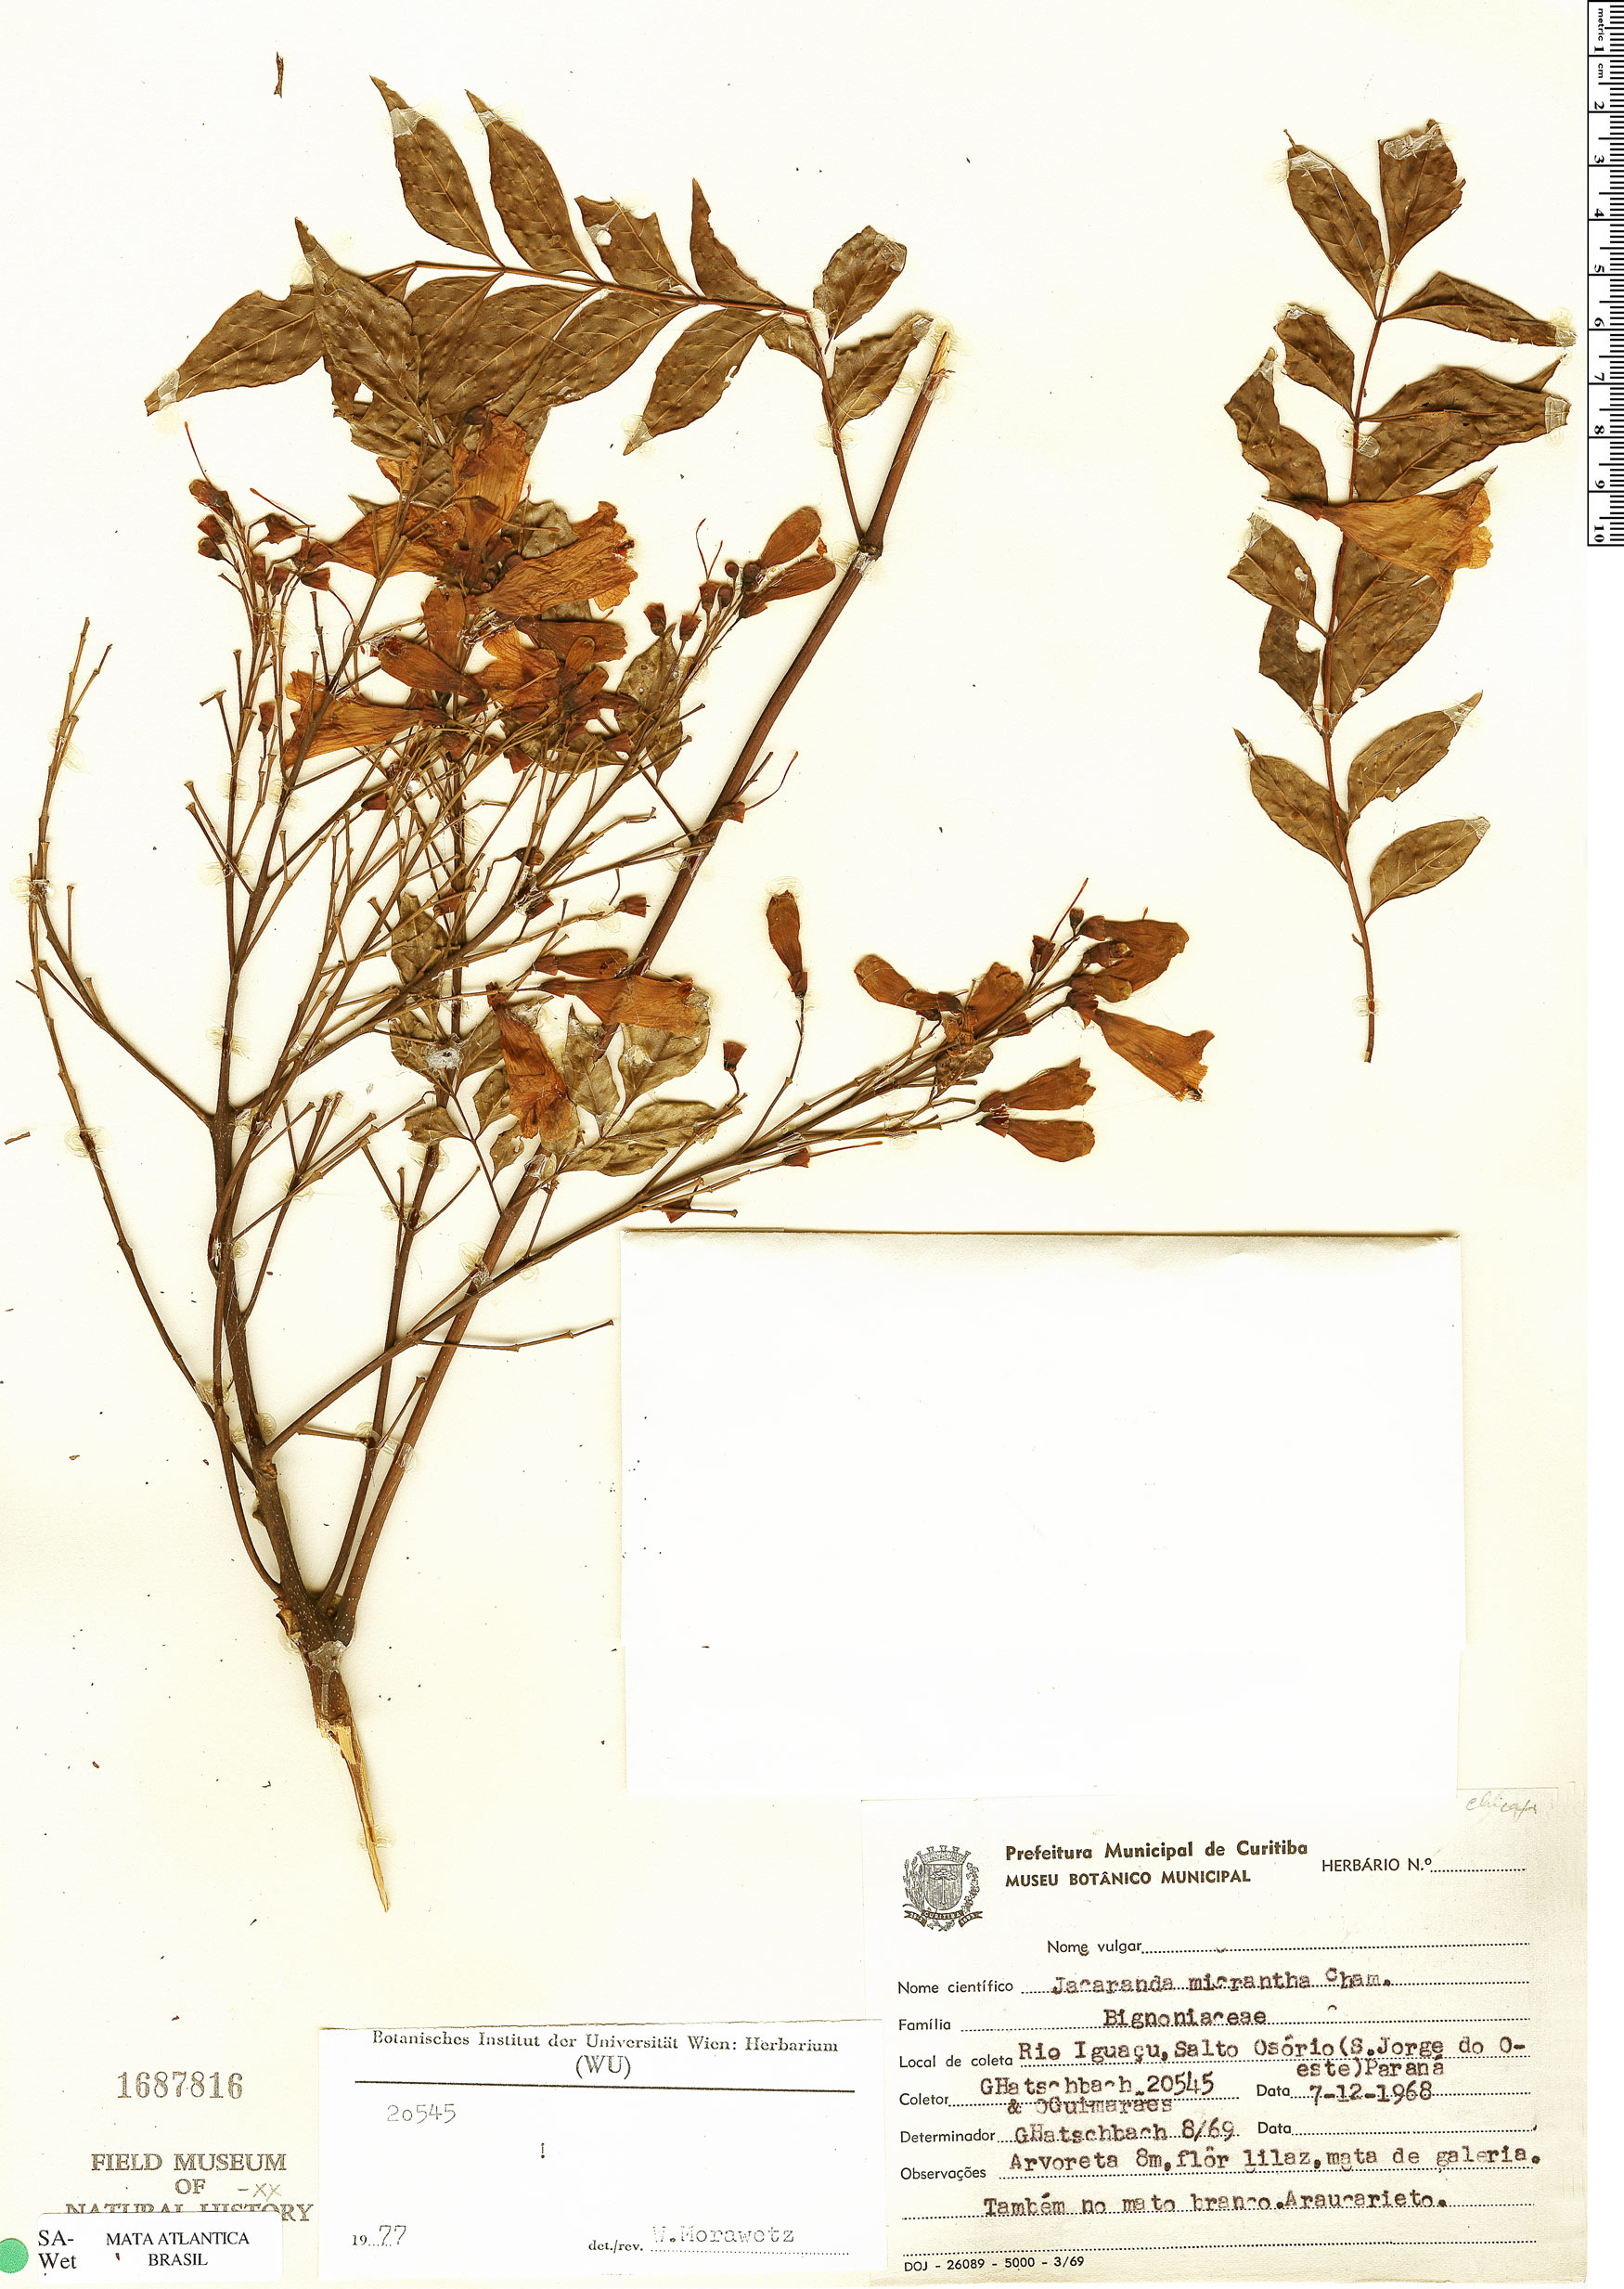 Specimen: Jacaranda micrantha